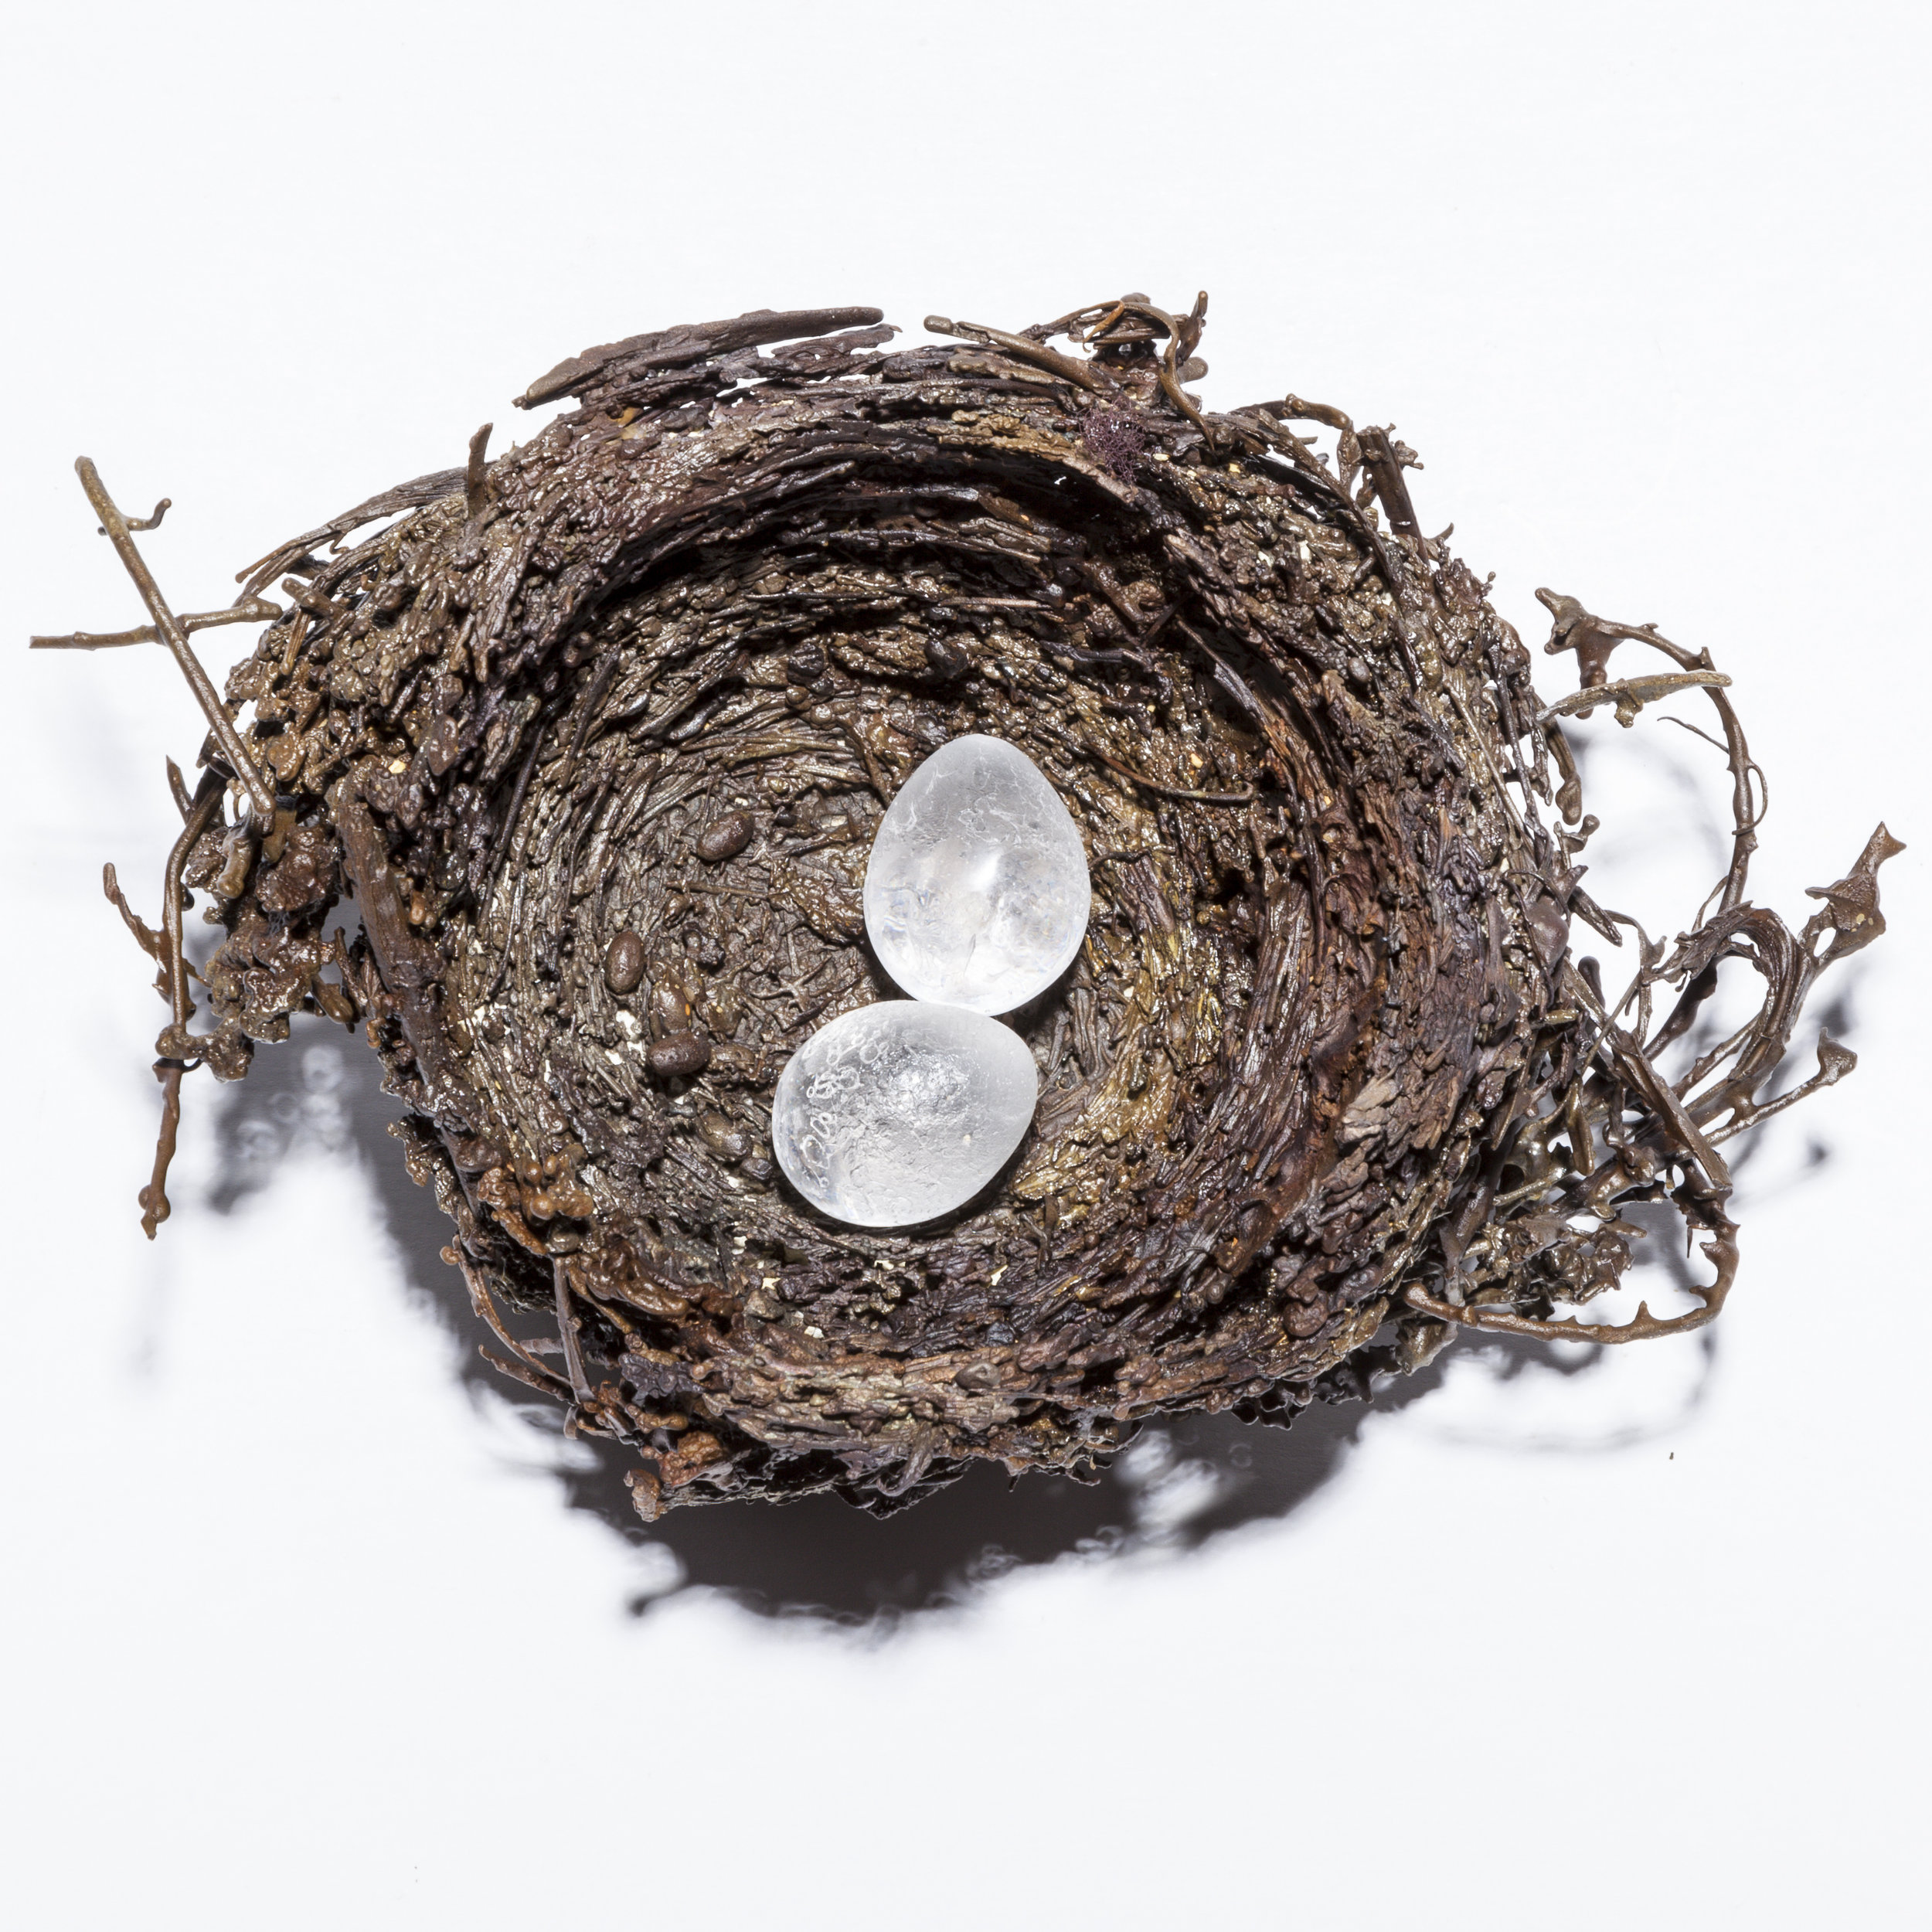 BaleCreekAllen Nests-004.jpg